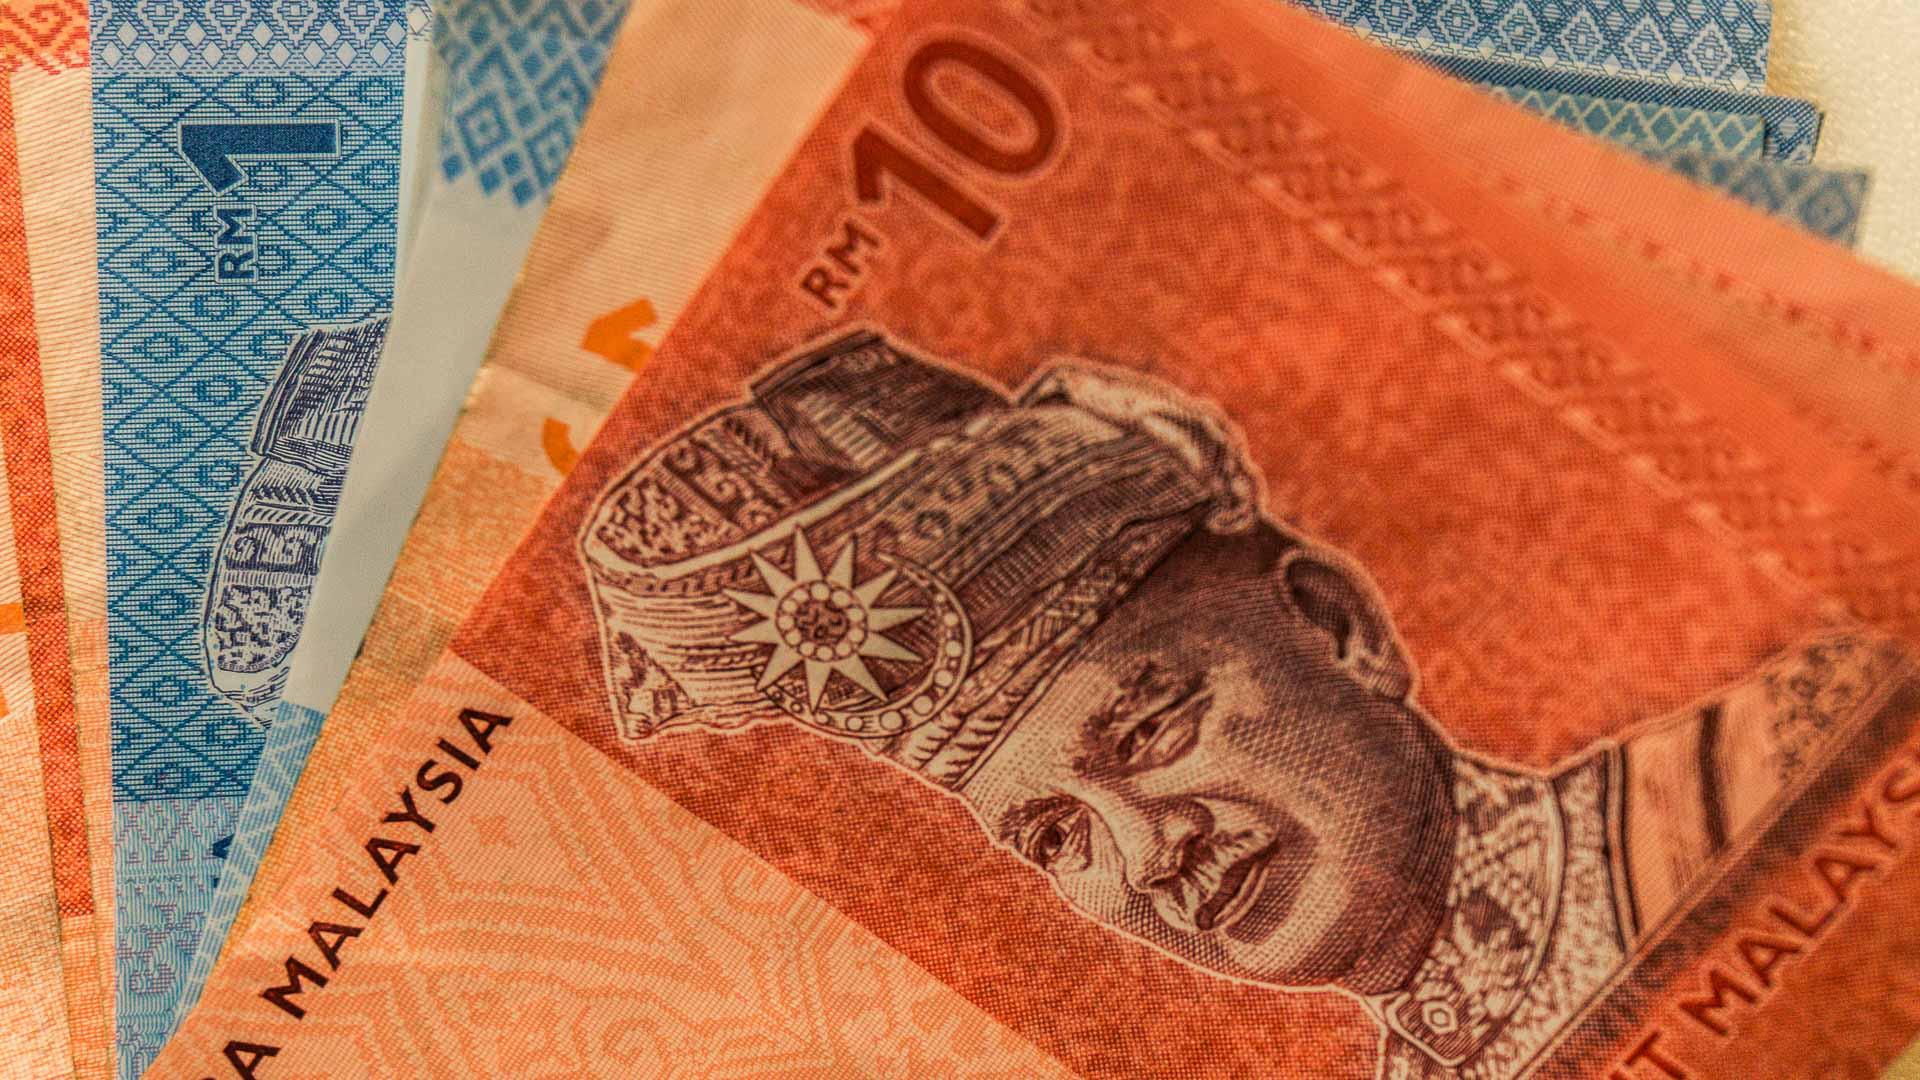 Malaysian ringgit. Is Malaysia expensive?